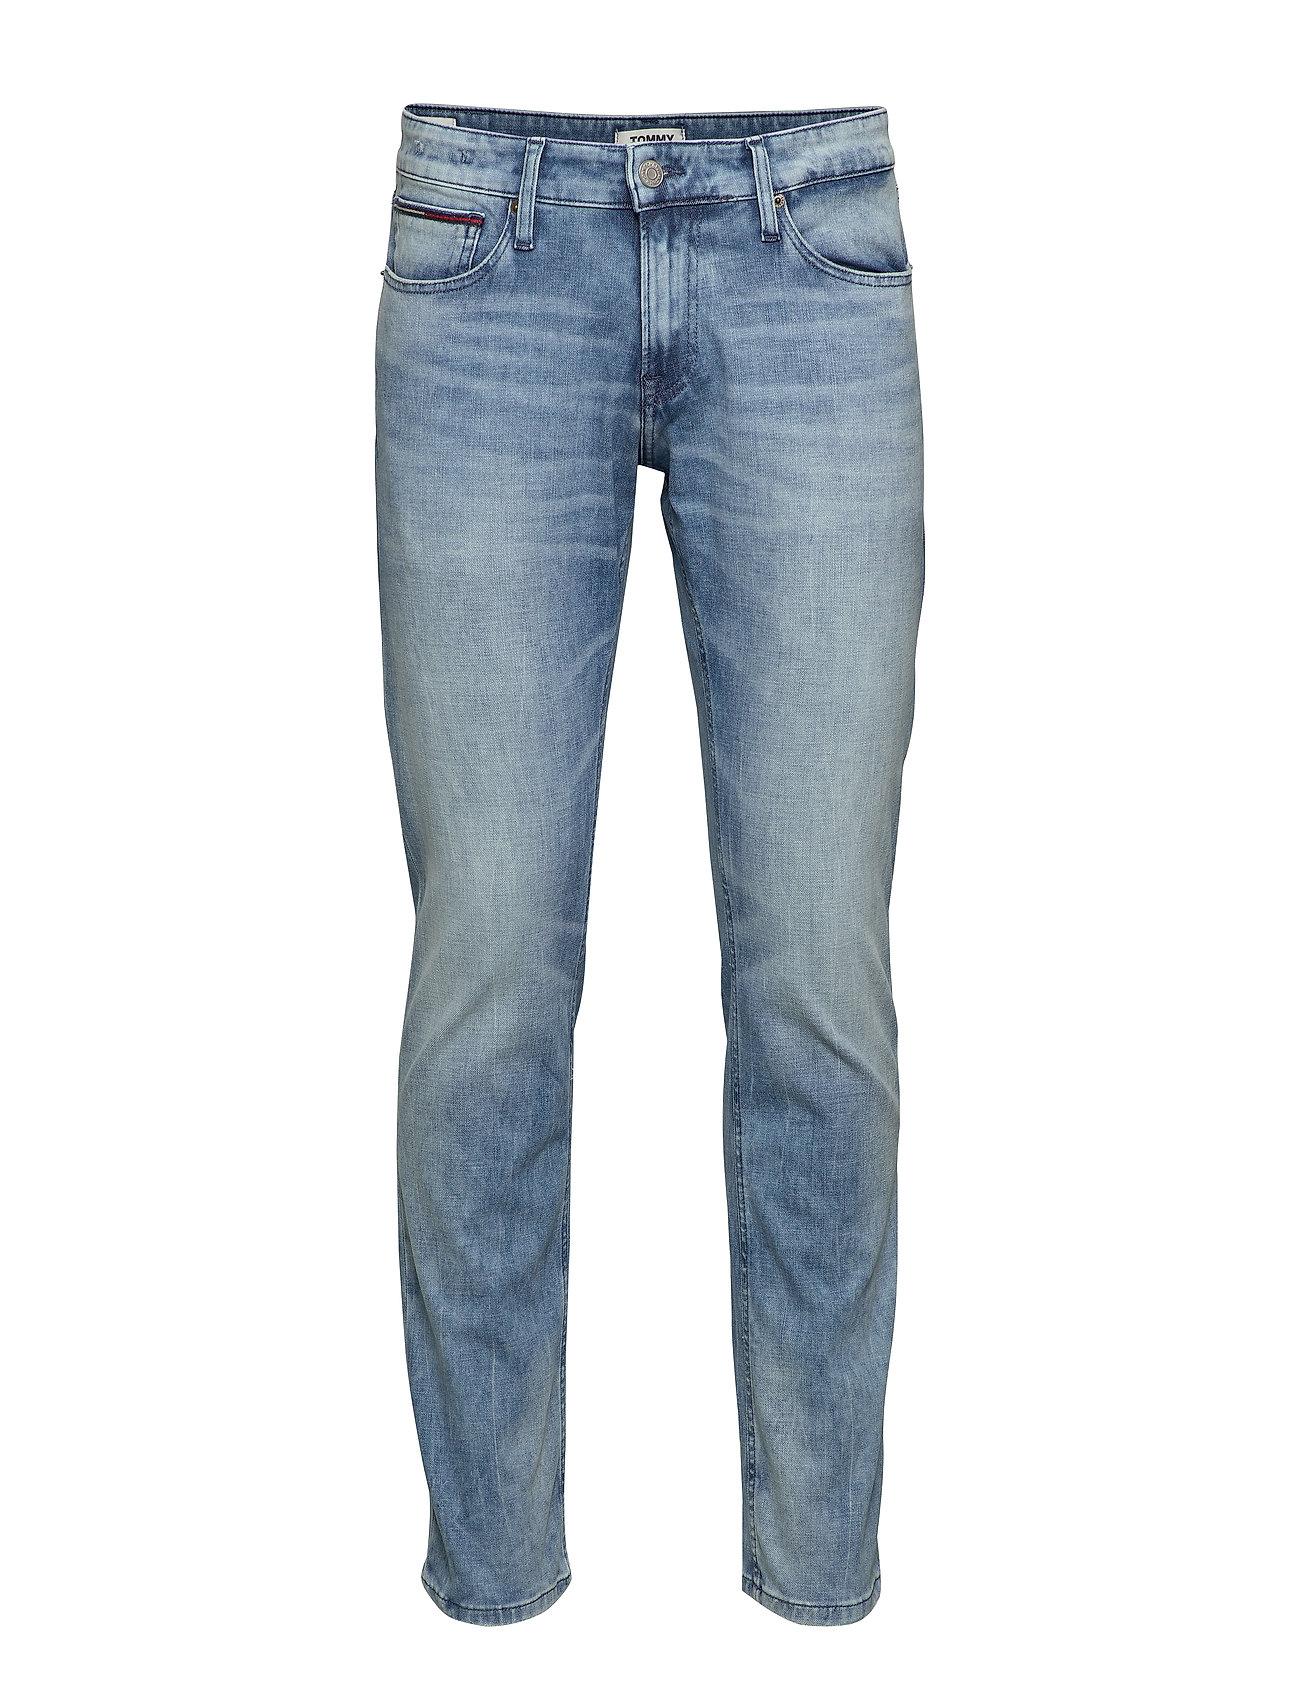 Tommy Jeans SCANTON SLIM DYCRL - DYNAMIC CROSS LT STR